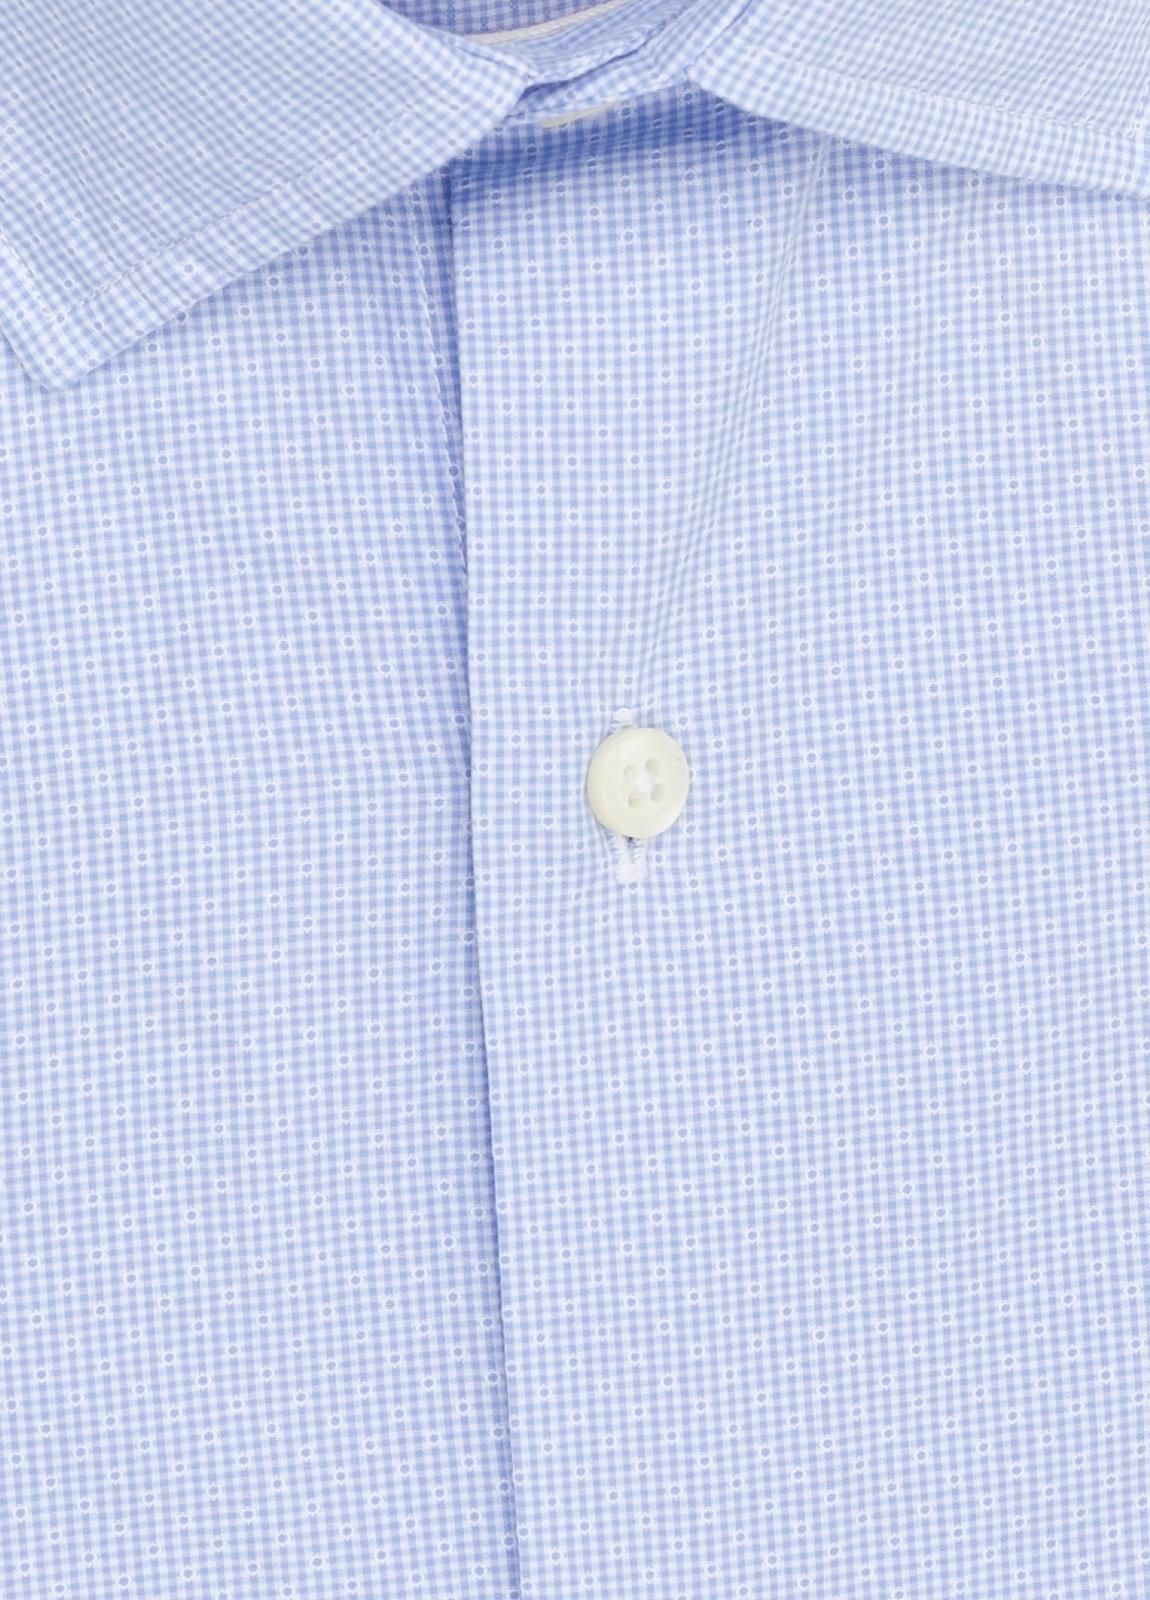 Camisa Casual Wear FUREST COLECCIÓN slim fit fil dibujo celeste - Ítem1